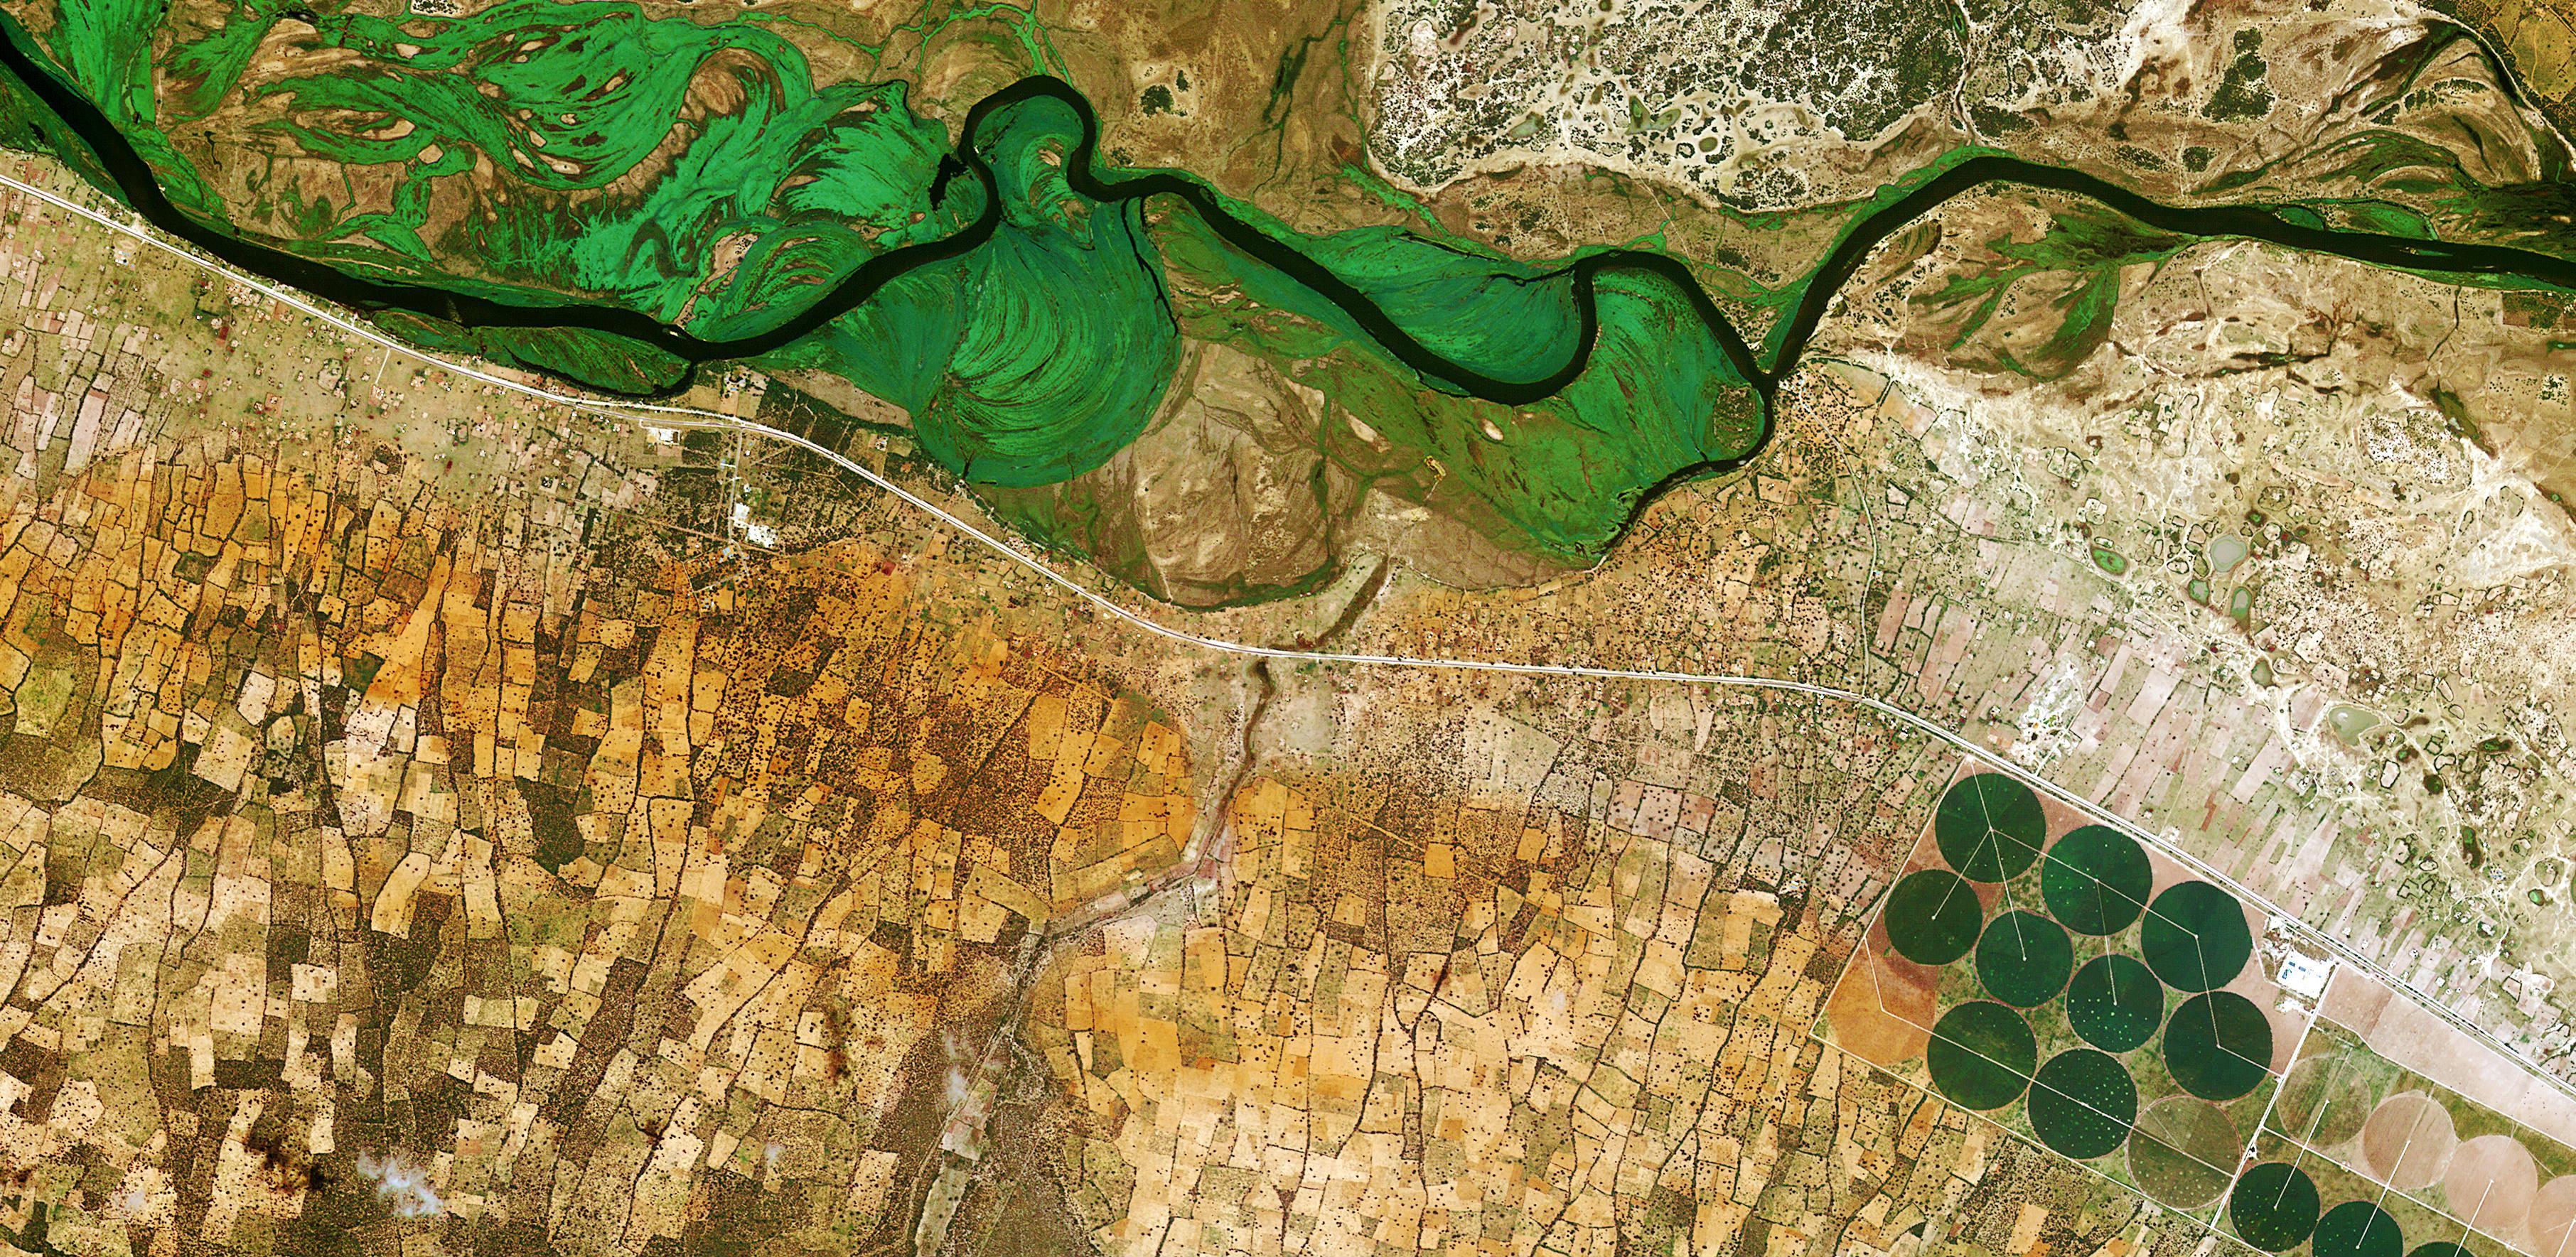 Photo credit: KARI/ESA - the Okavango River